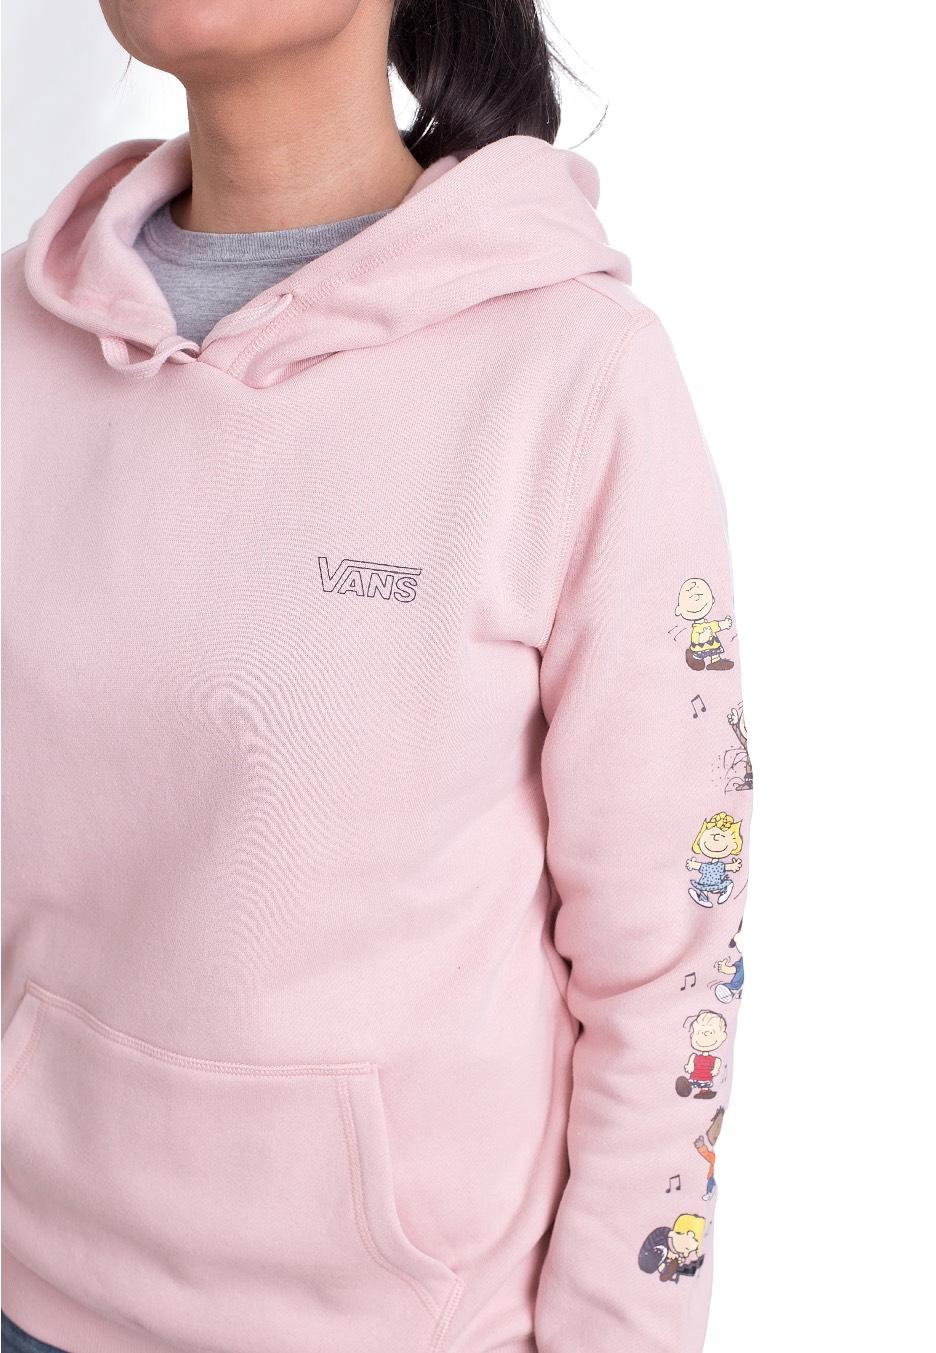 Sweats À Pink Impericon Capuche X Peanuts Vans Dance XwqapIX